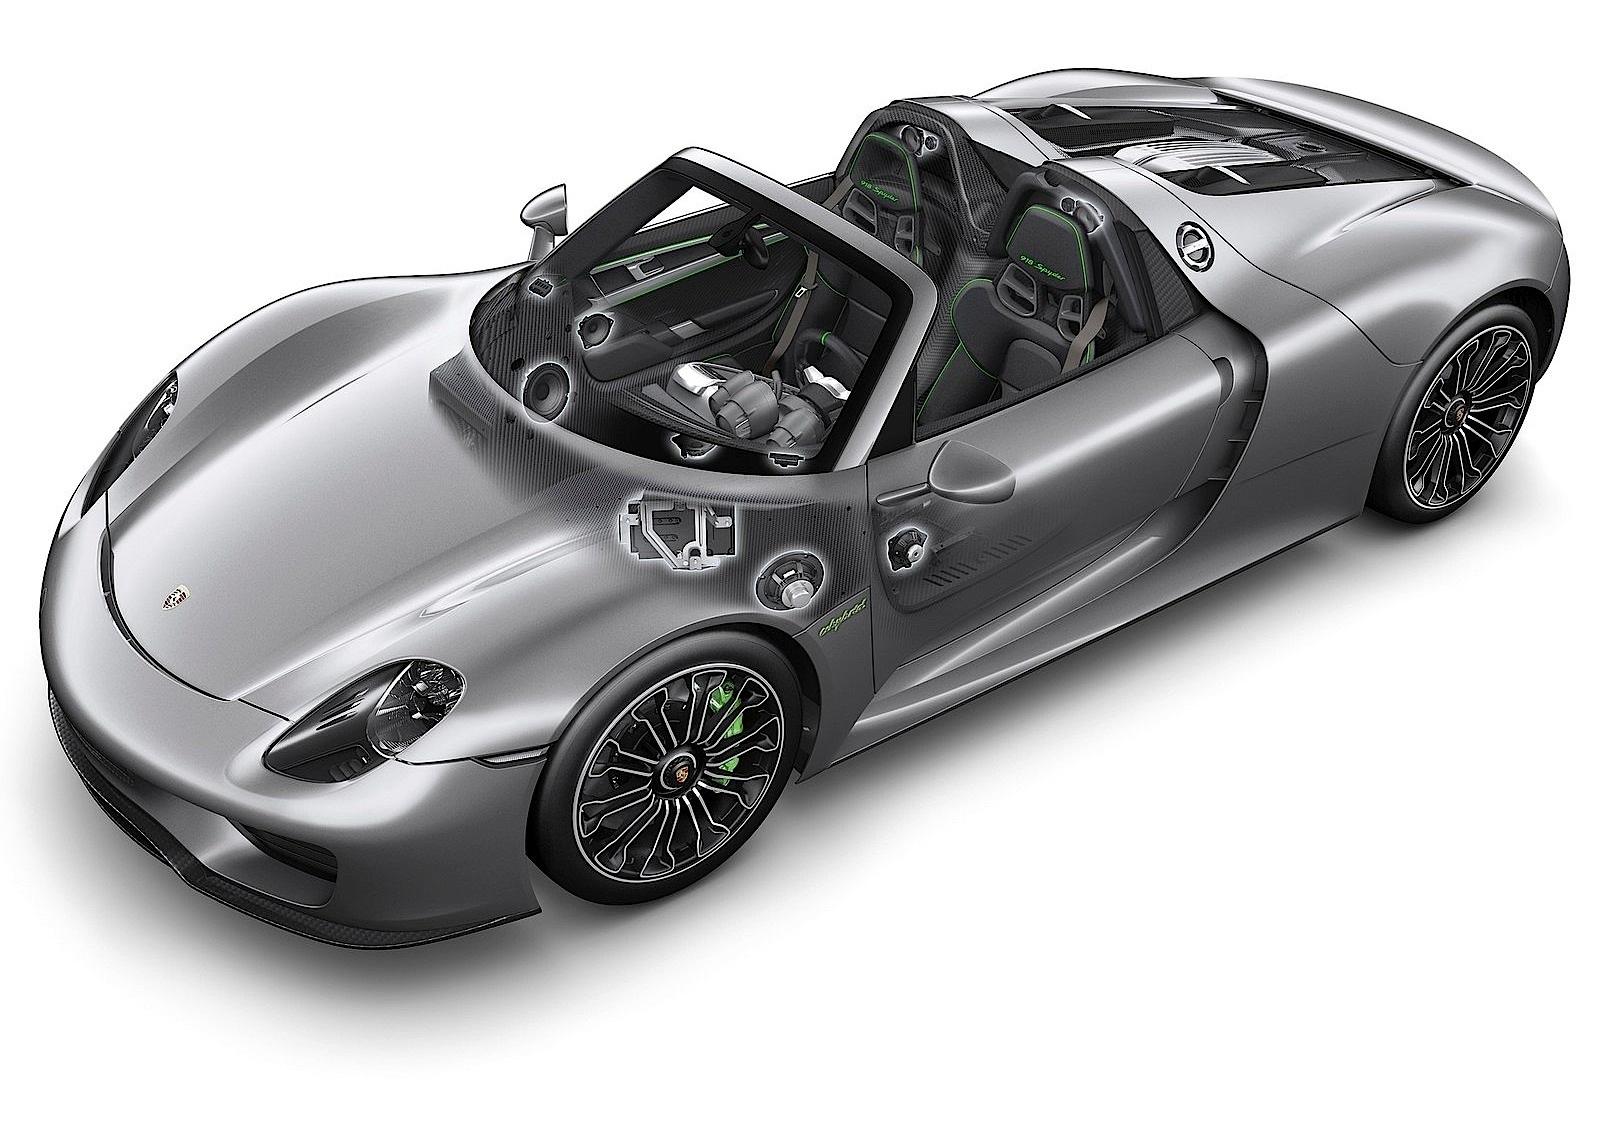 Porsche Ground Clearance on porsche macan, porsche gt, porsche spyder, porsche p1, porsche gt2, porsche hybrid, porsche supercar, porsche gt3, porsche boxster,